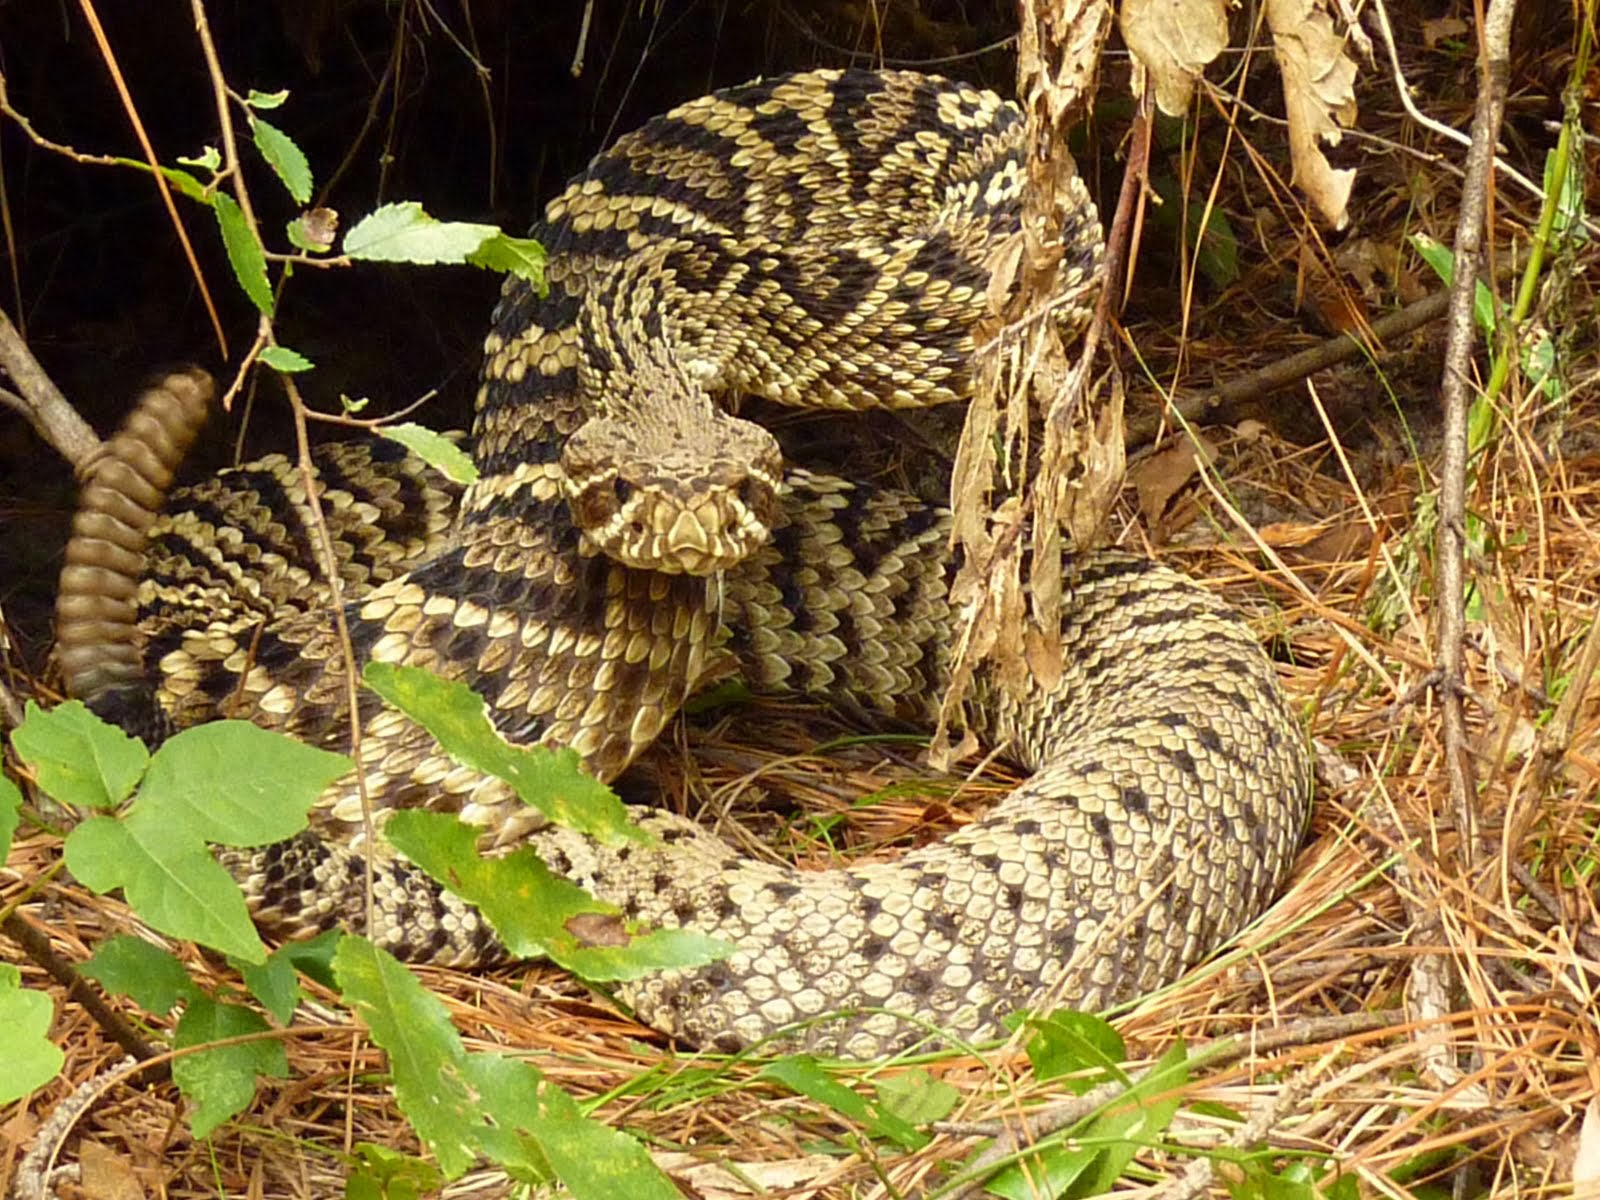 Wallpapers Rattlesnake Wallpapers